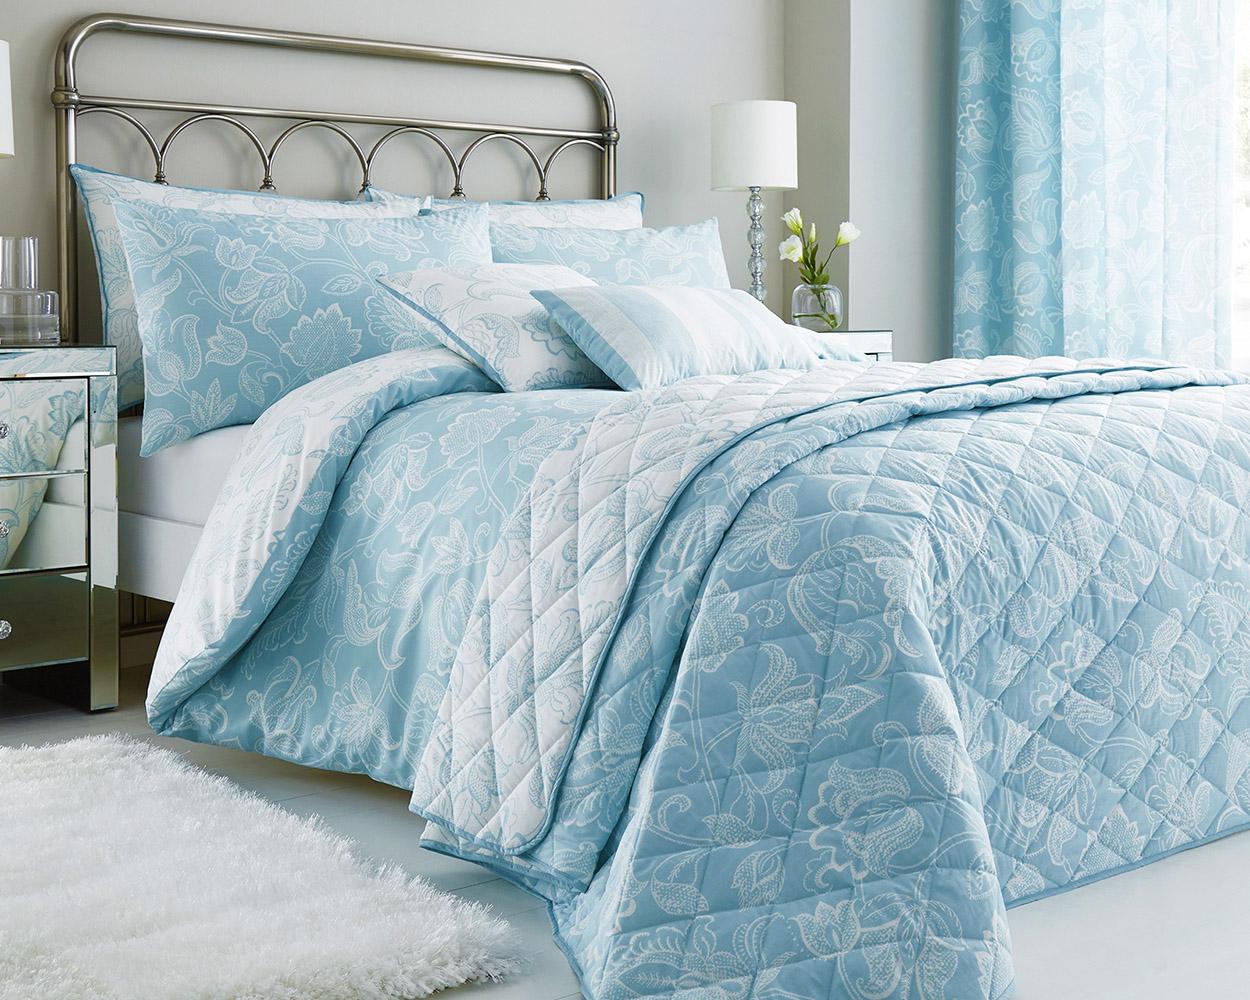 Cary Cotton Rich Floral Design Duvet Set and Bedding Range in Duck Egg Blue